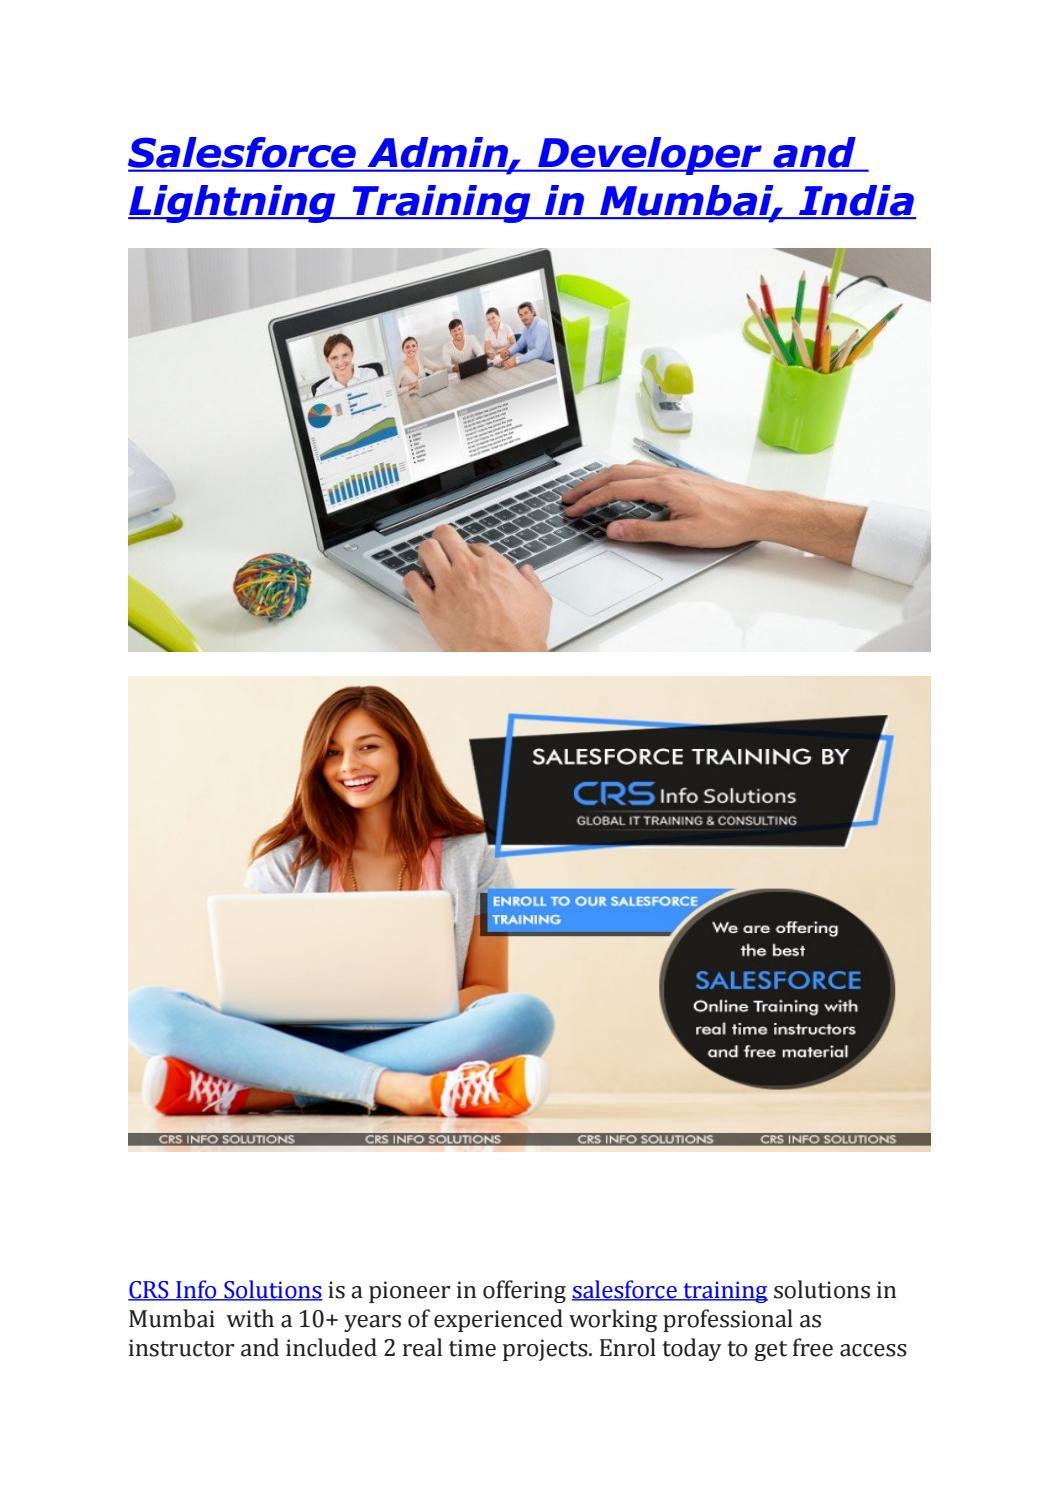 Salesforce(admin, developer and lightning) Online training